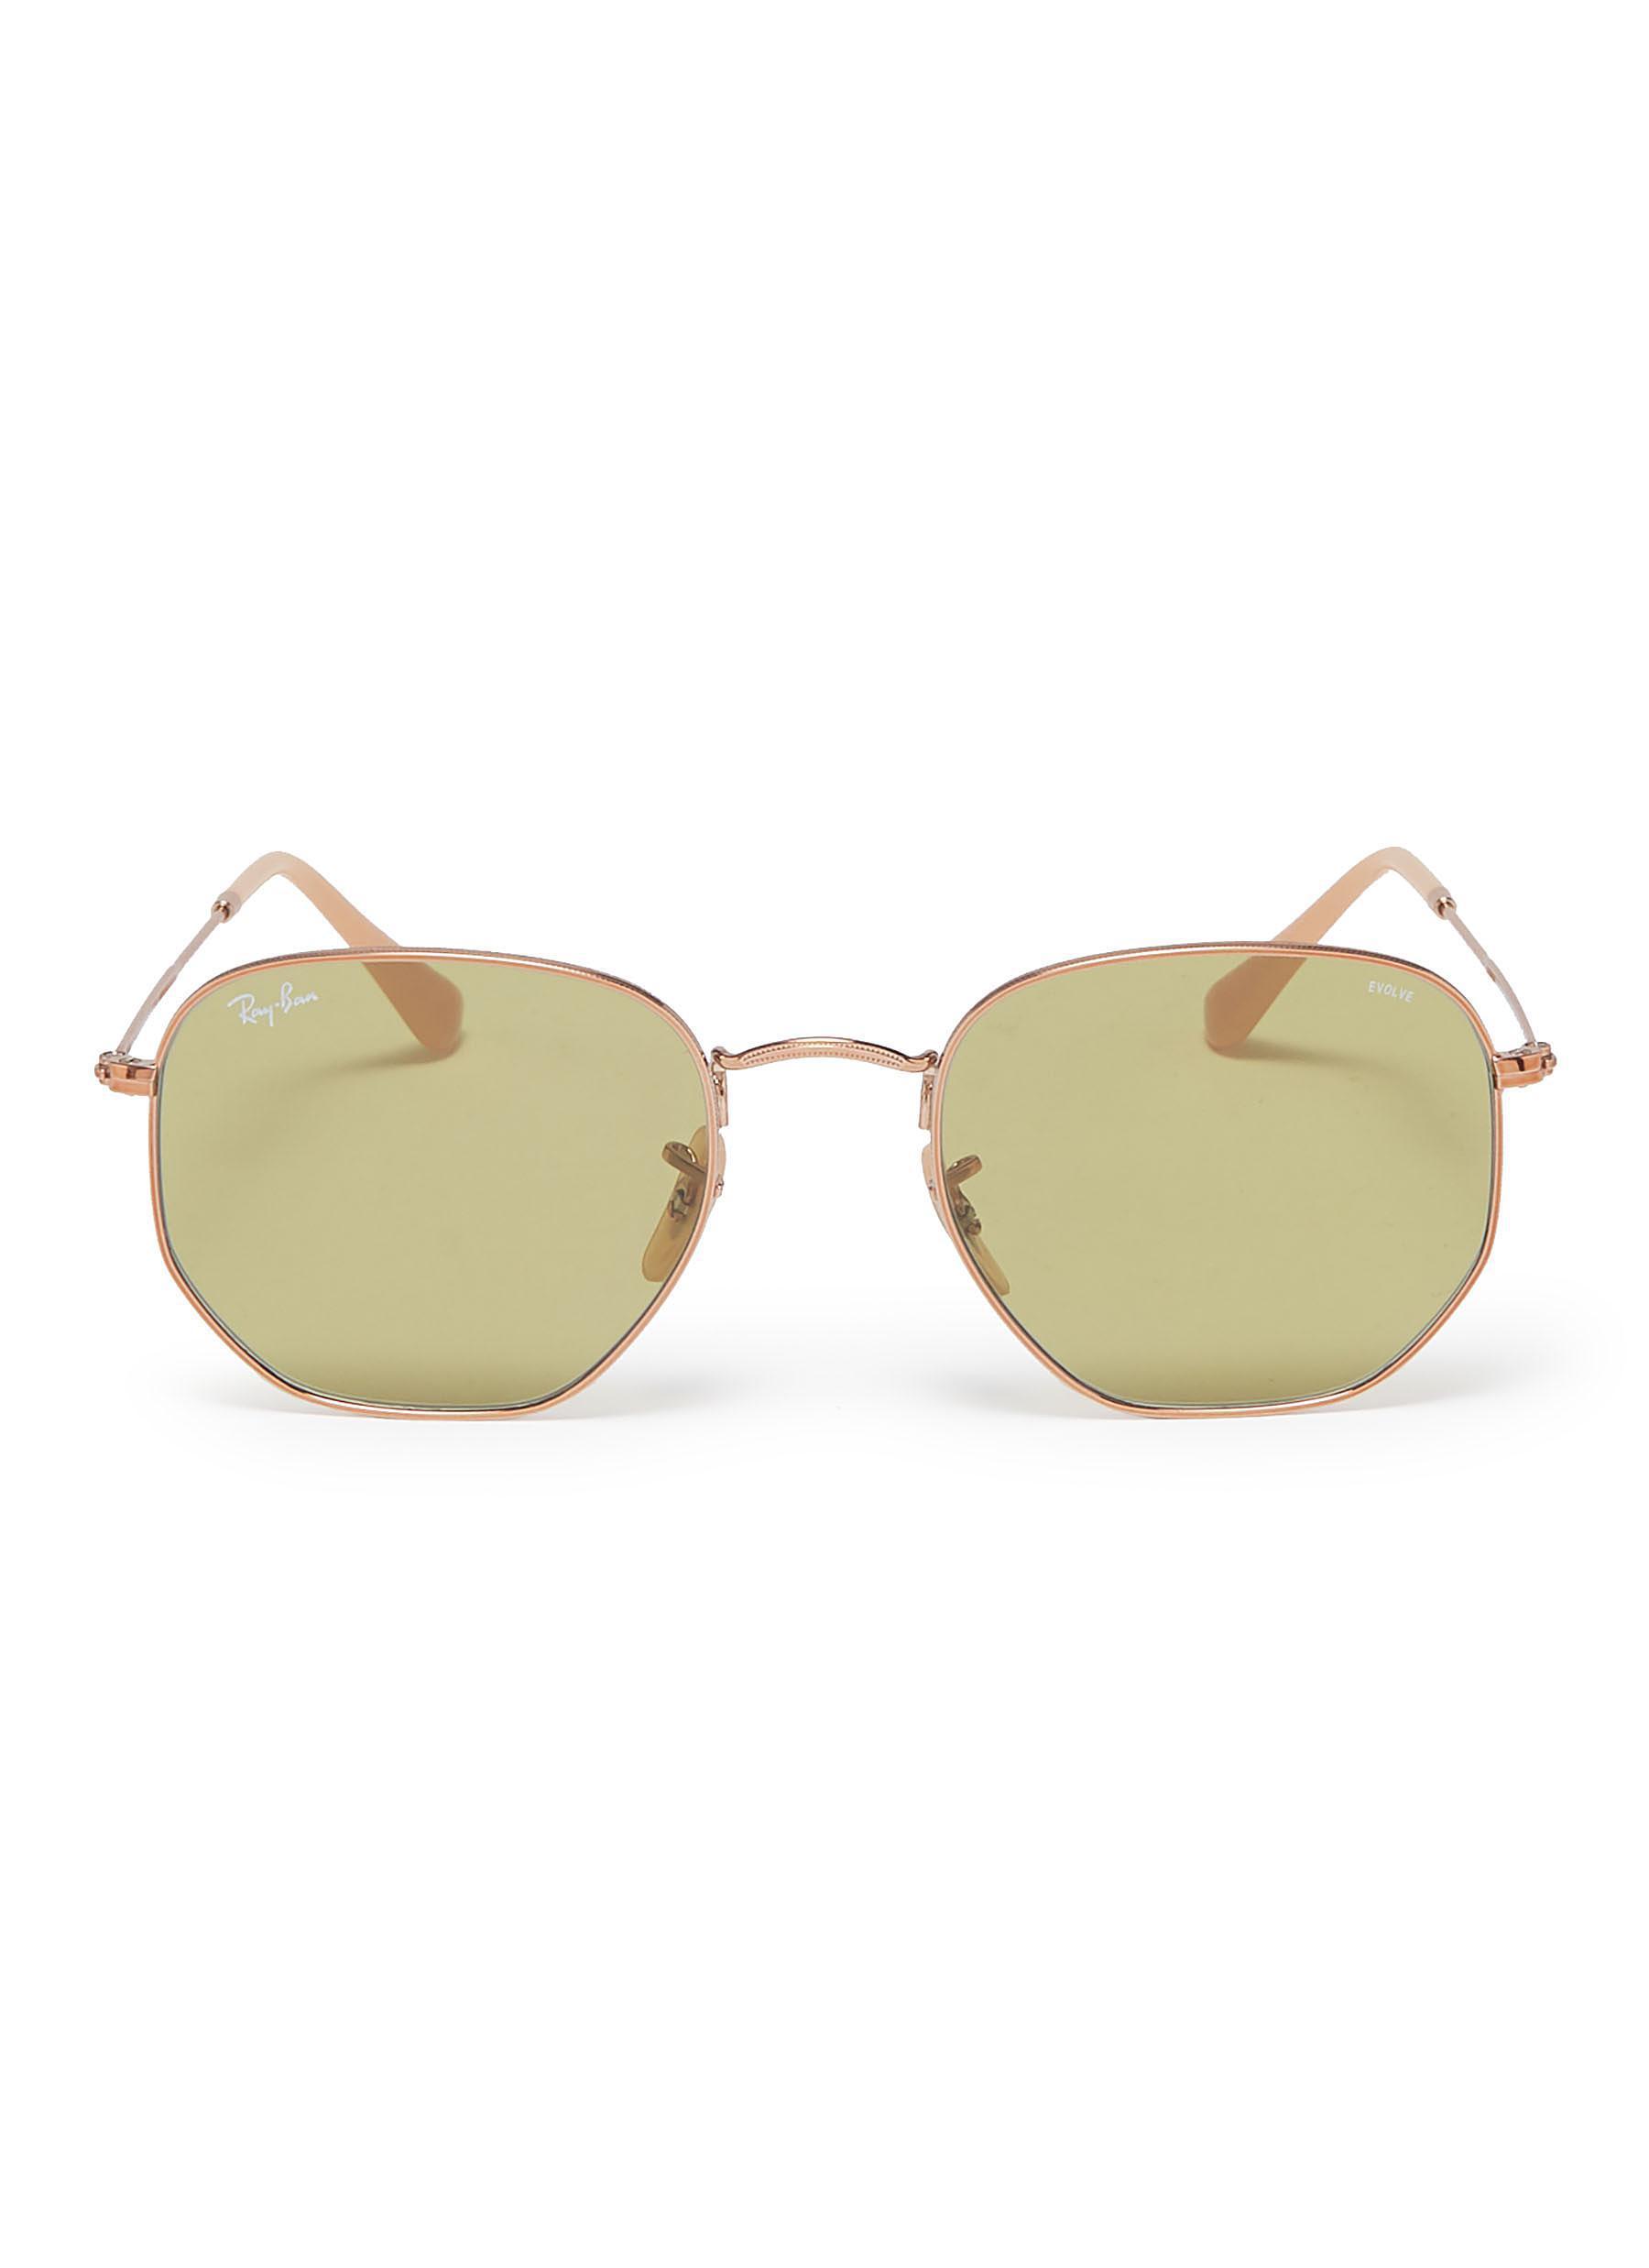 d6019bfaae Lyst - Ray-Ban  rb3548  Metal Hexagonal Frame Sunglasses in Metallic ...